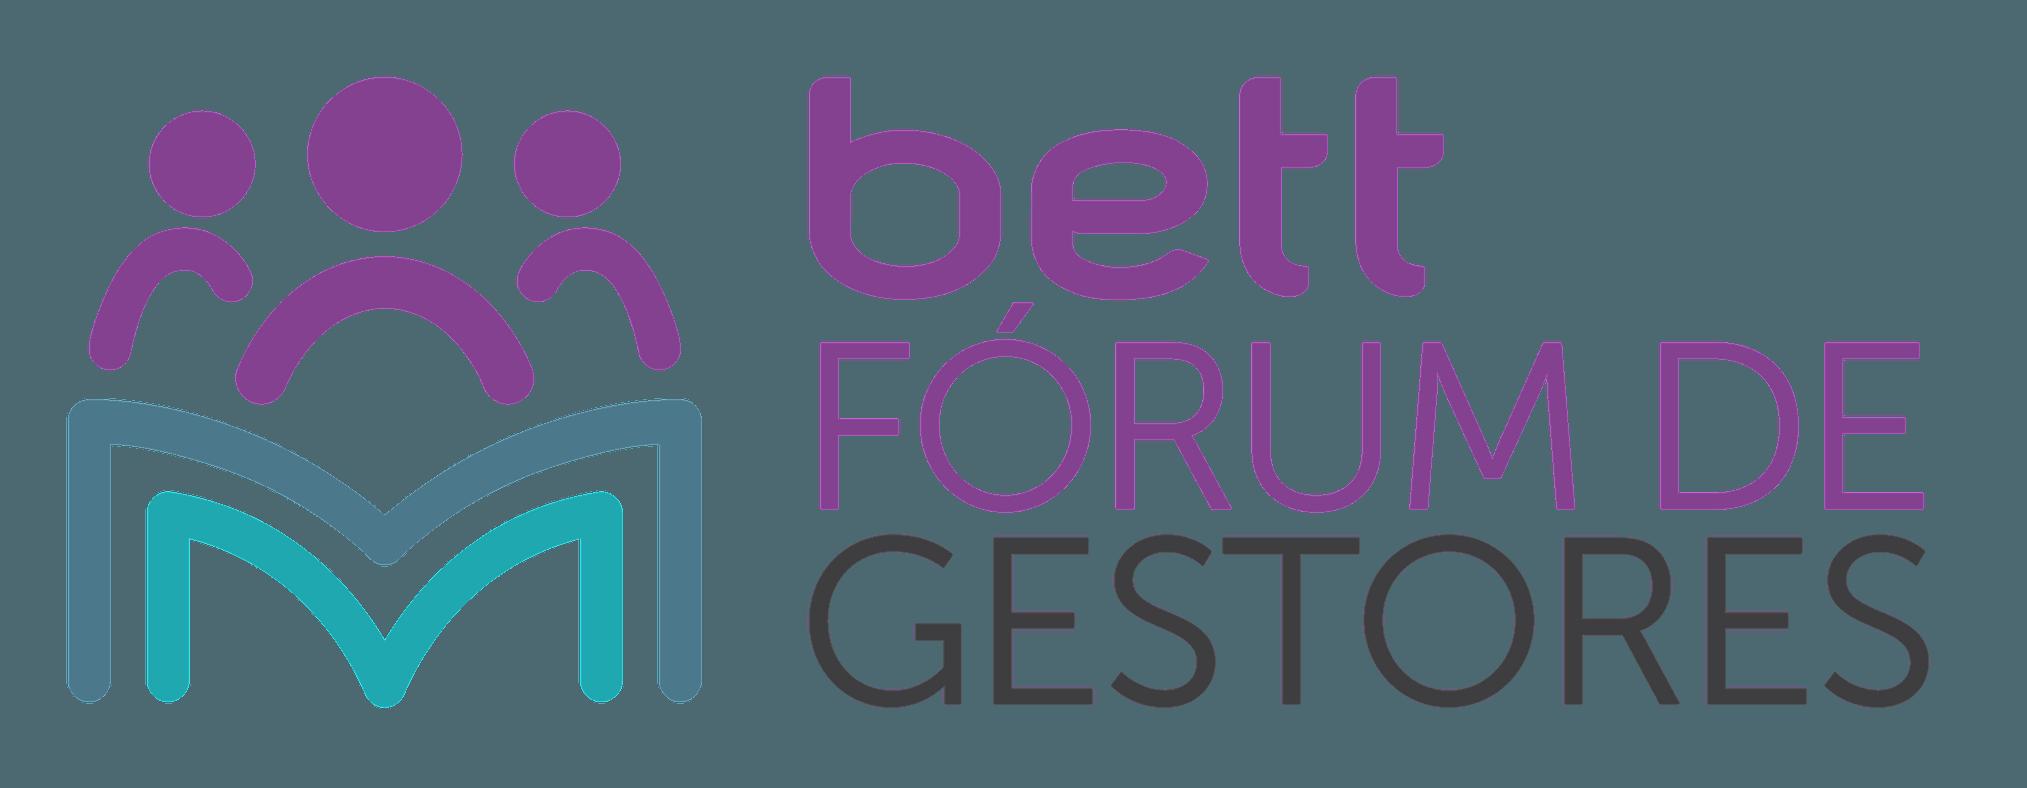 Forum de Gestores